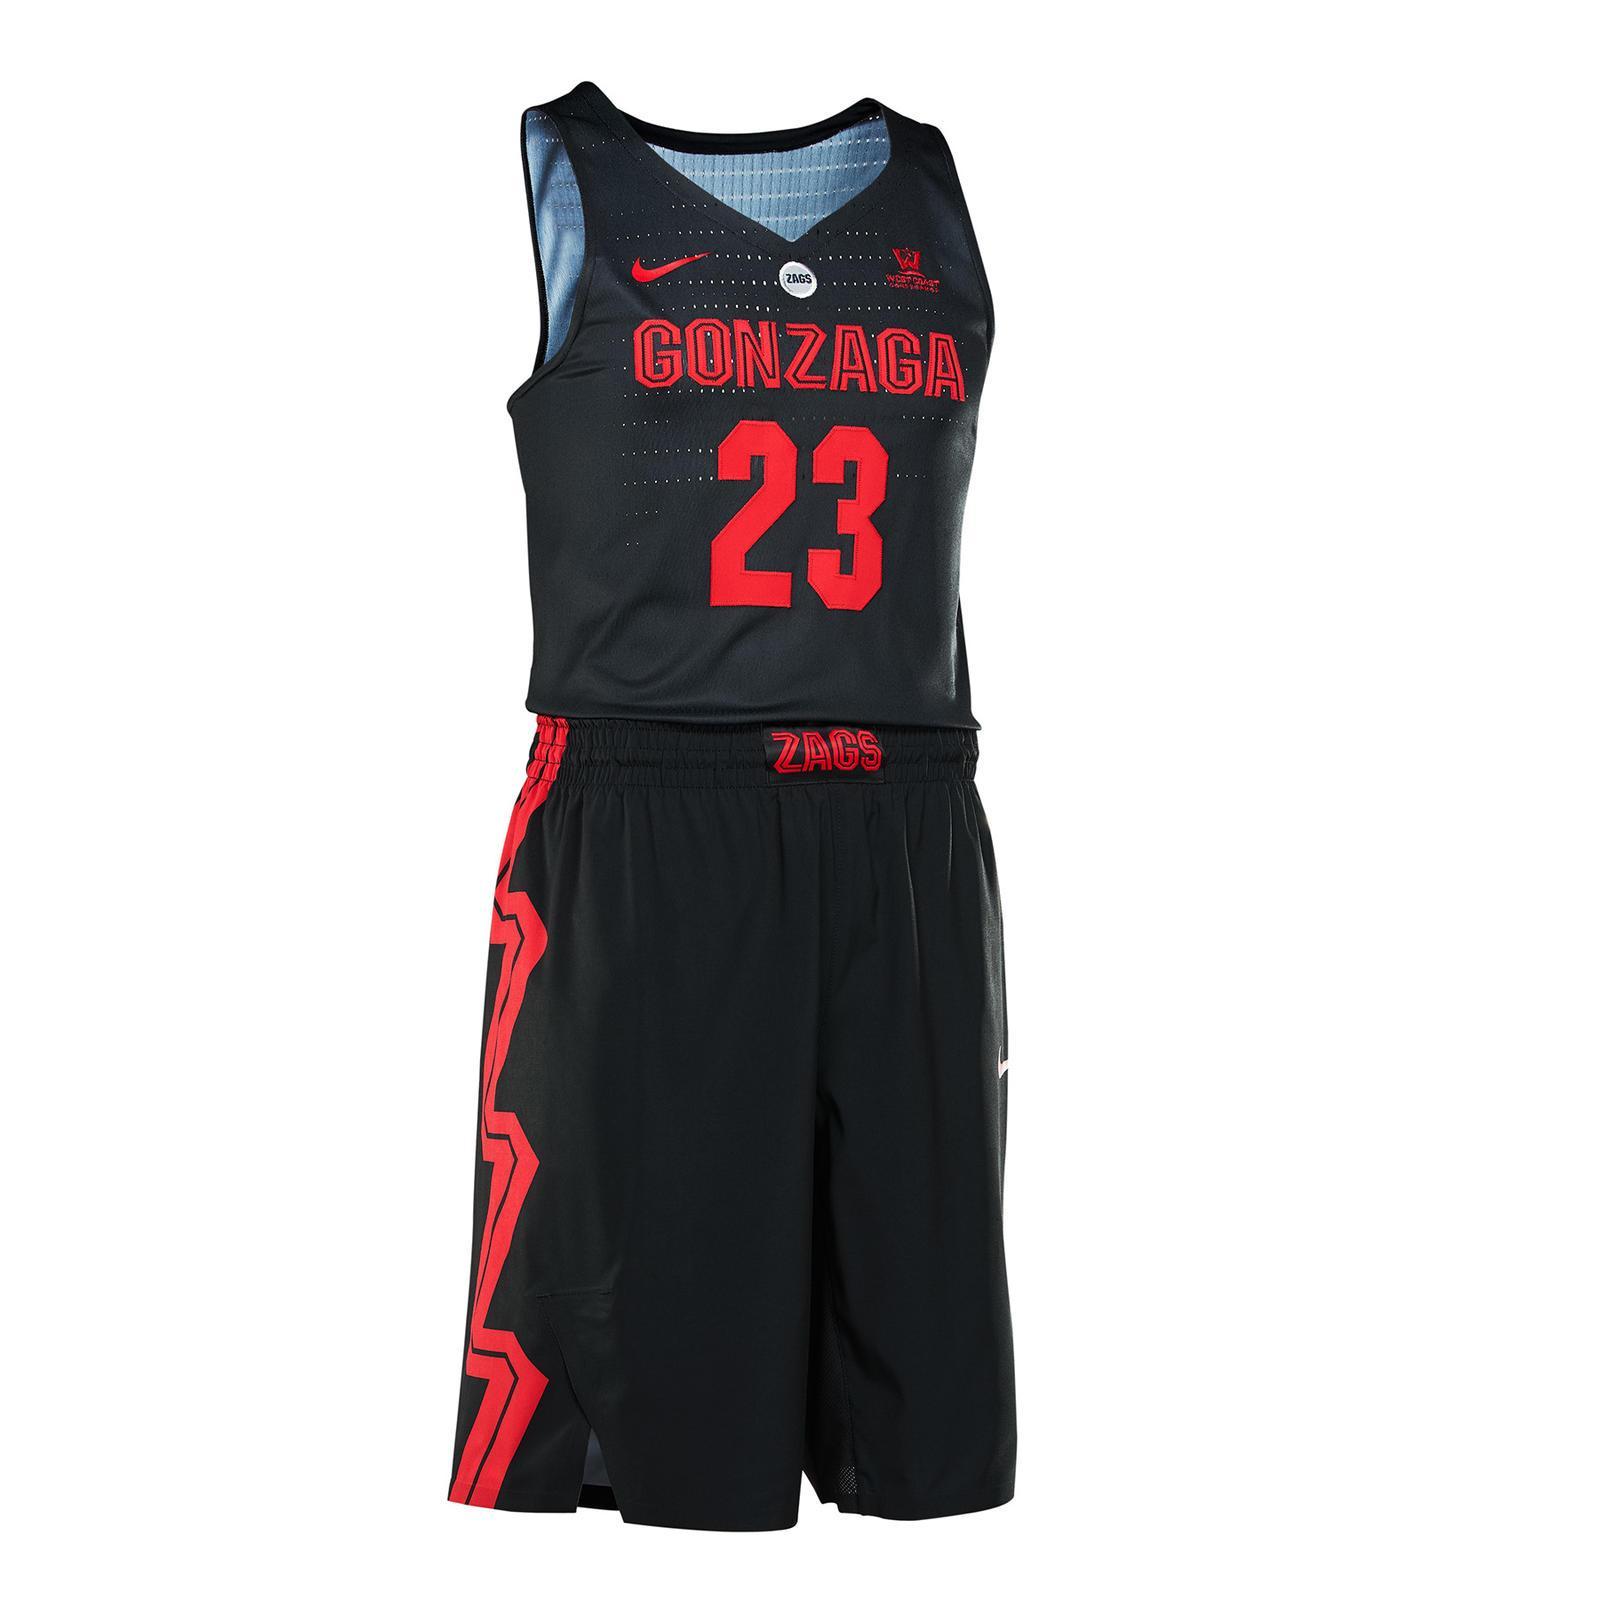 gonzaga donning special nike uniforms at pk80 the spokesman review rh spokesman com VCU Basketball Logo North Carolina Basketball Logo